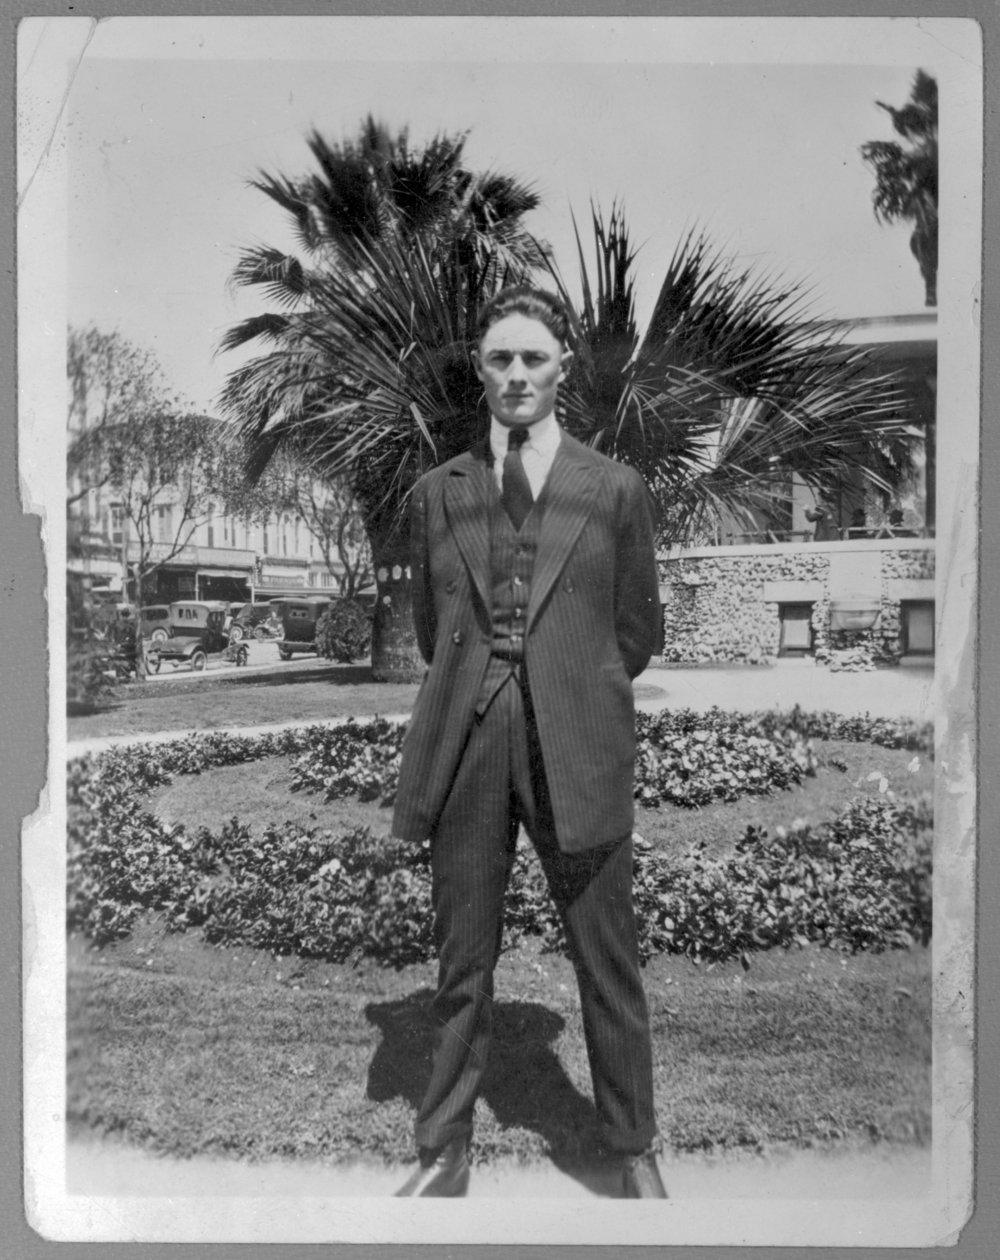 Virgil Barnes in San Antonio, Texas - Virgil Barnes. (*14)